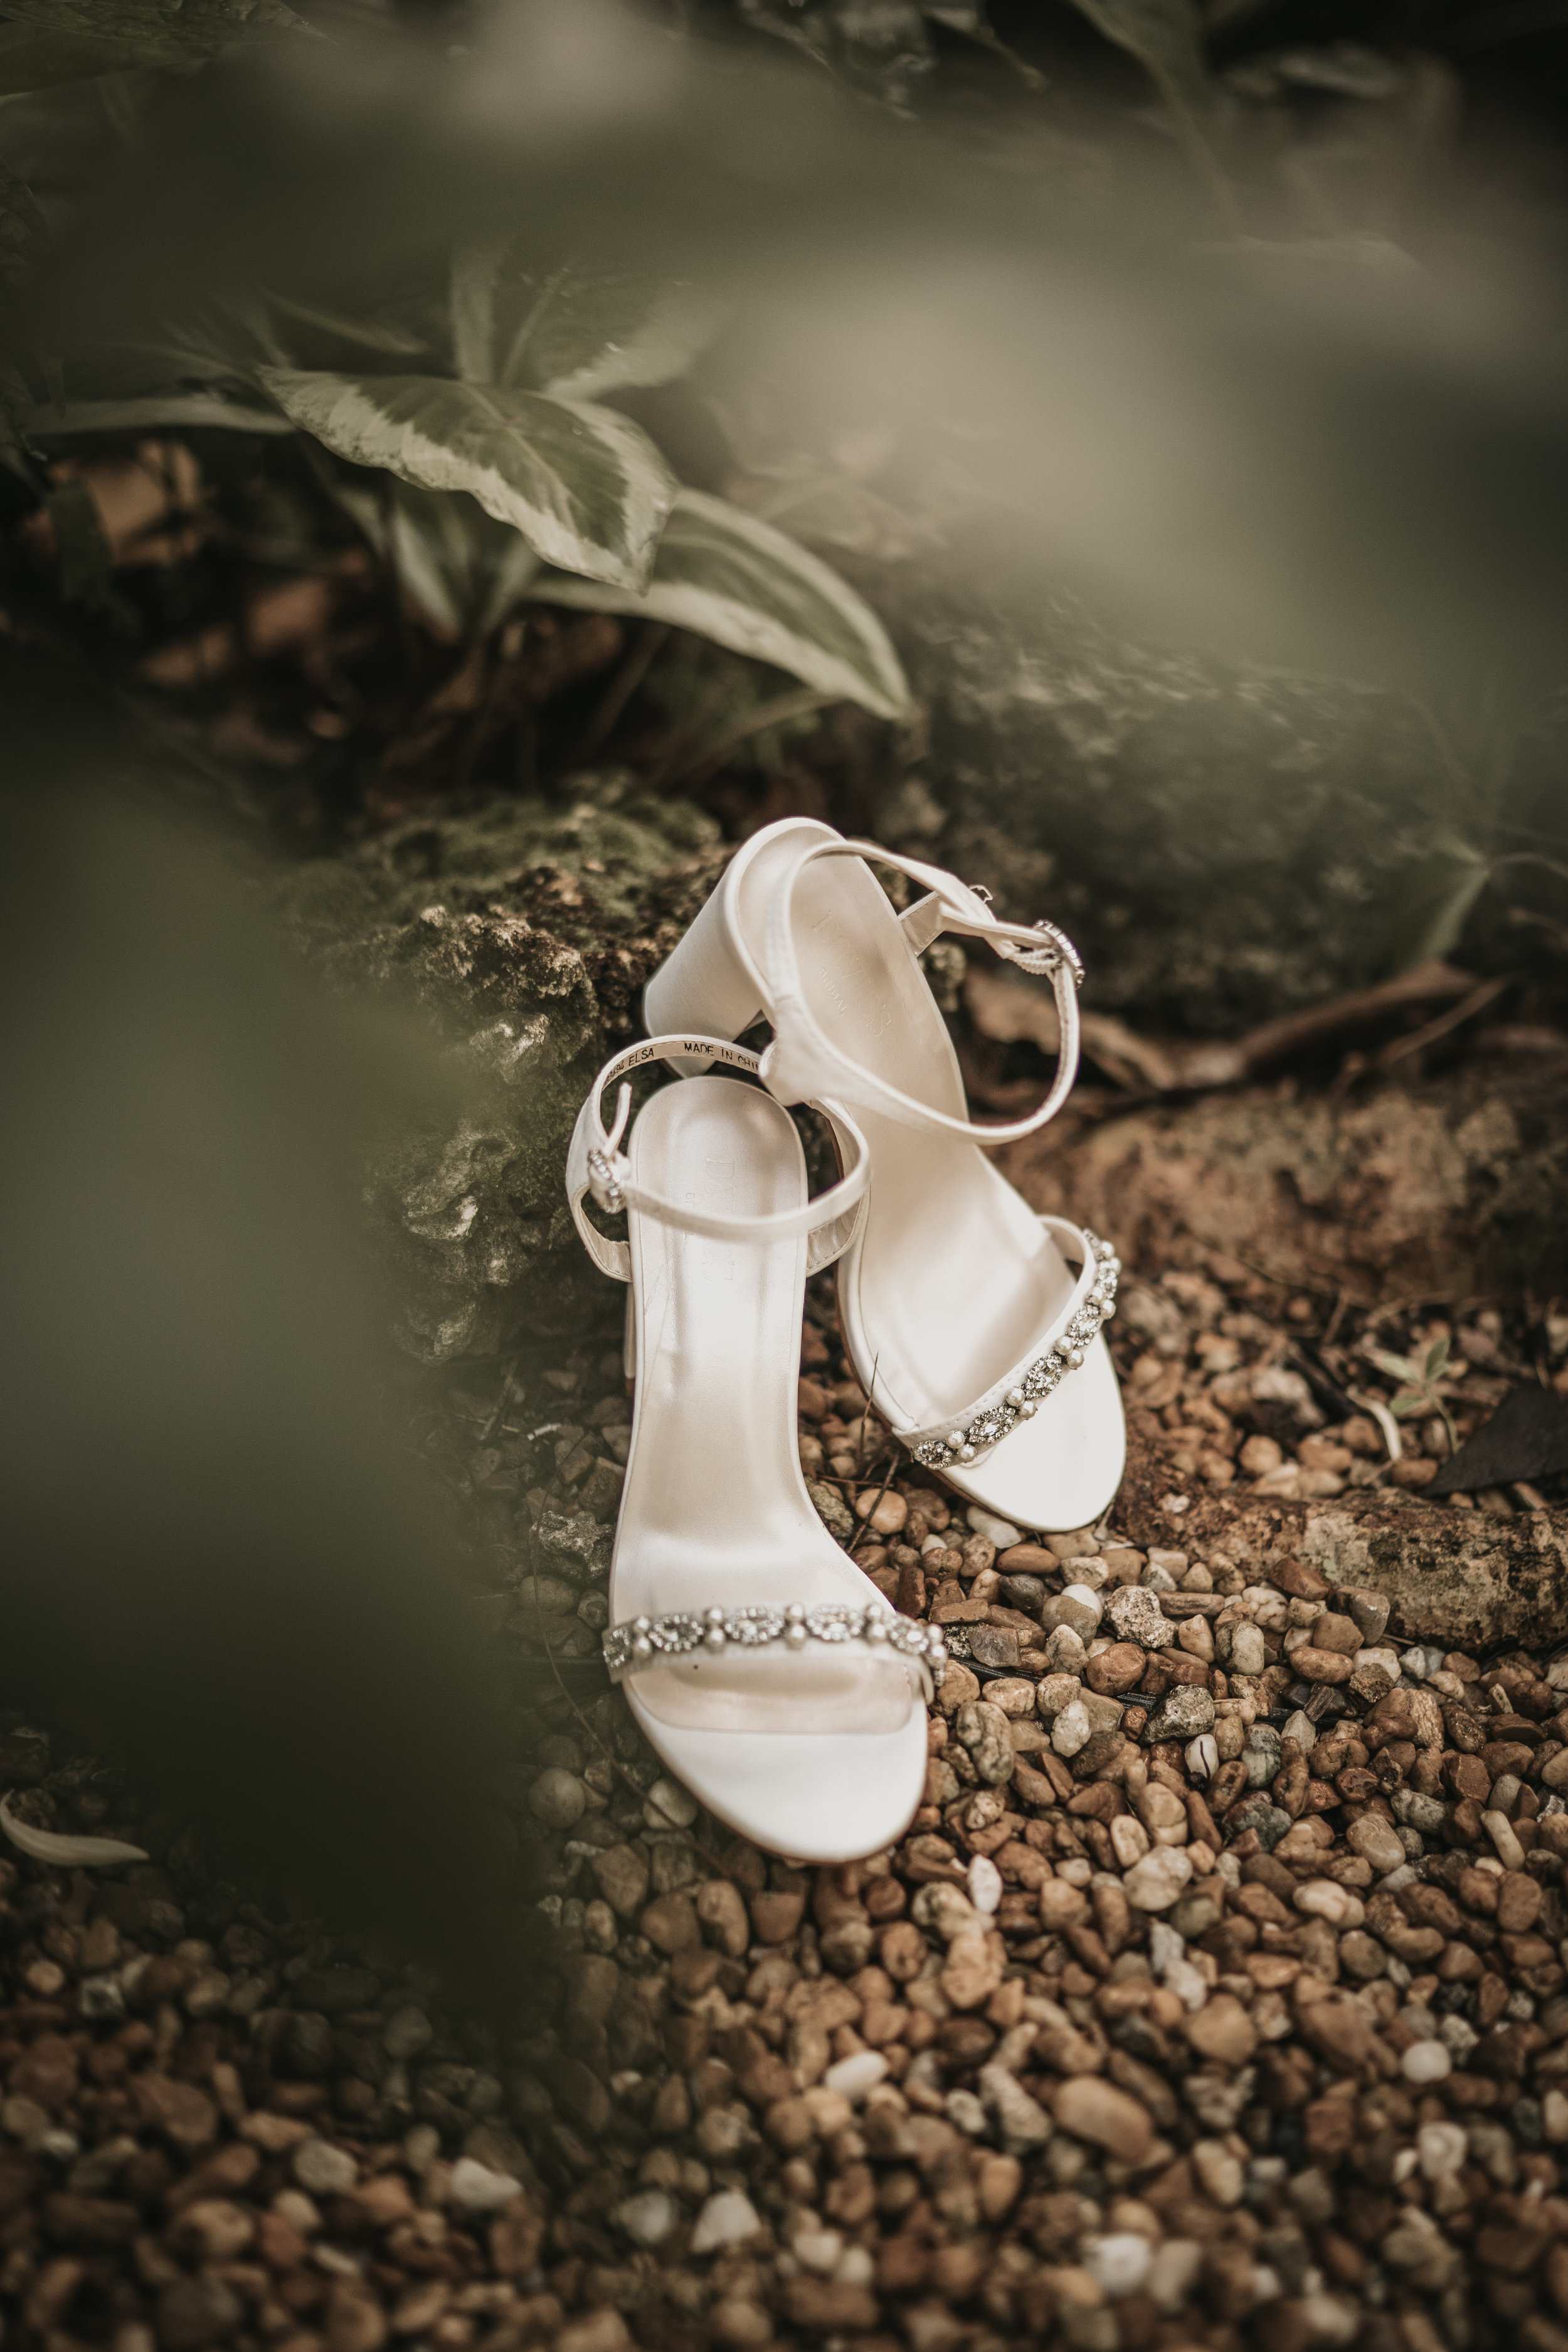 125MICHI&GABEWEDDINGDAY(WeddingFinal).jpg